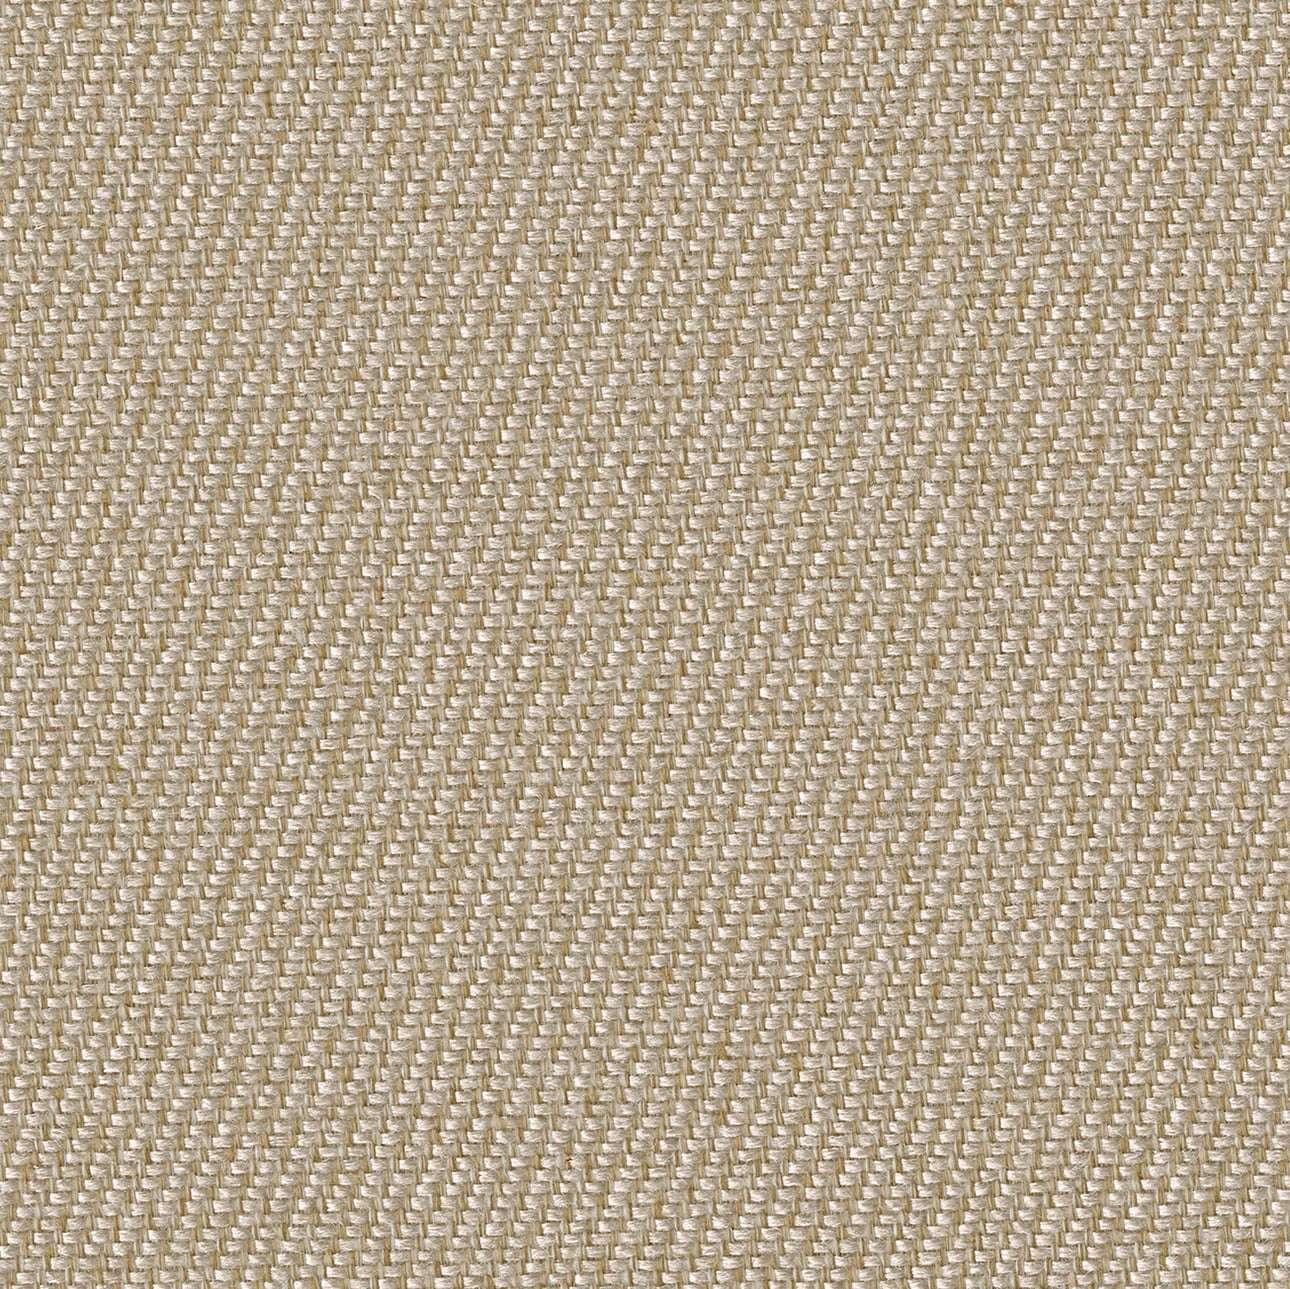 Poťah na kocku Solsta Pällbo V kolekcii Living, tkanina: 160-73